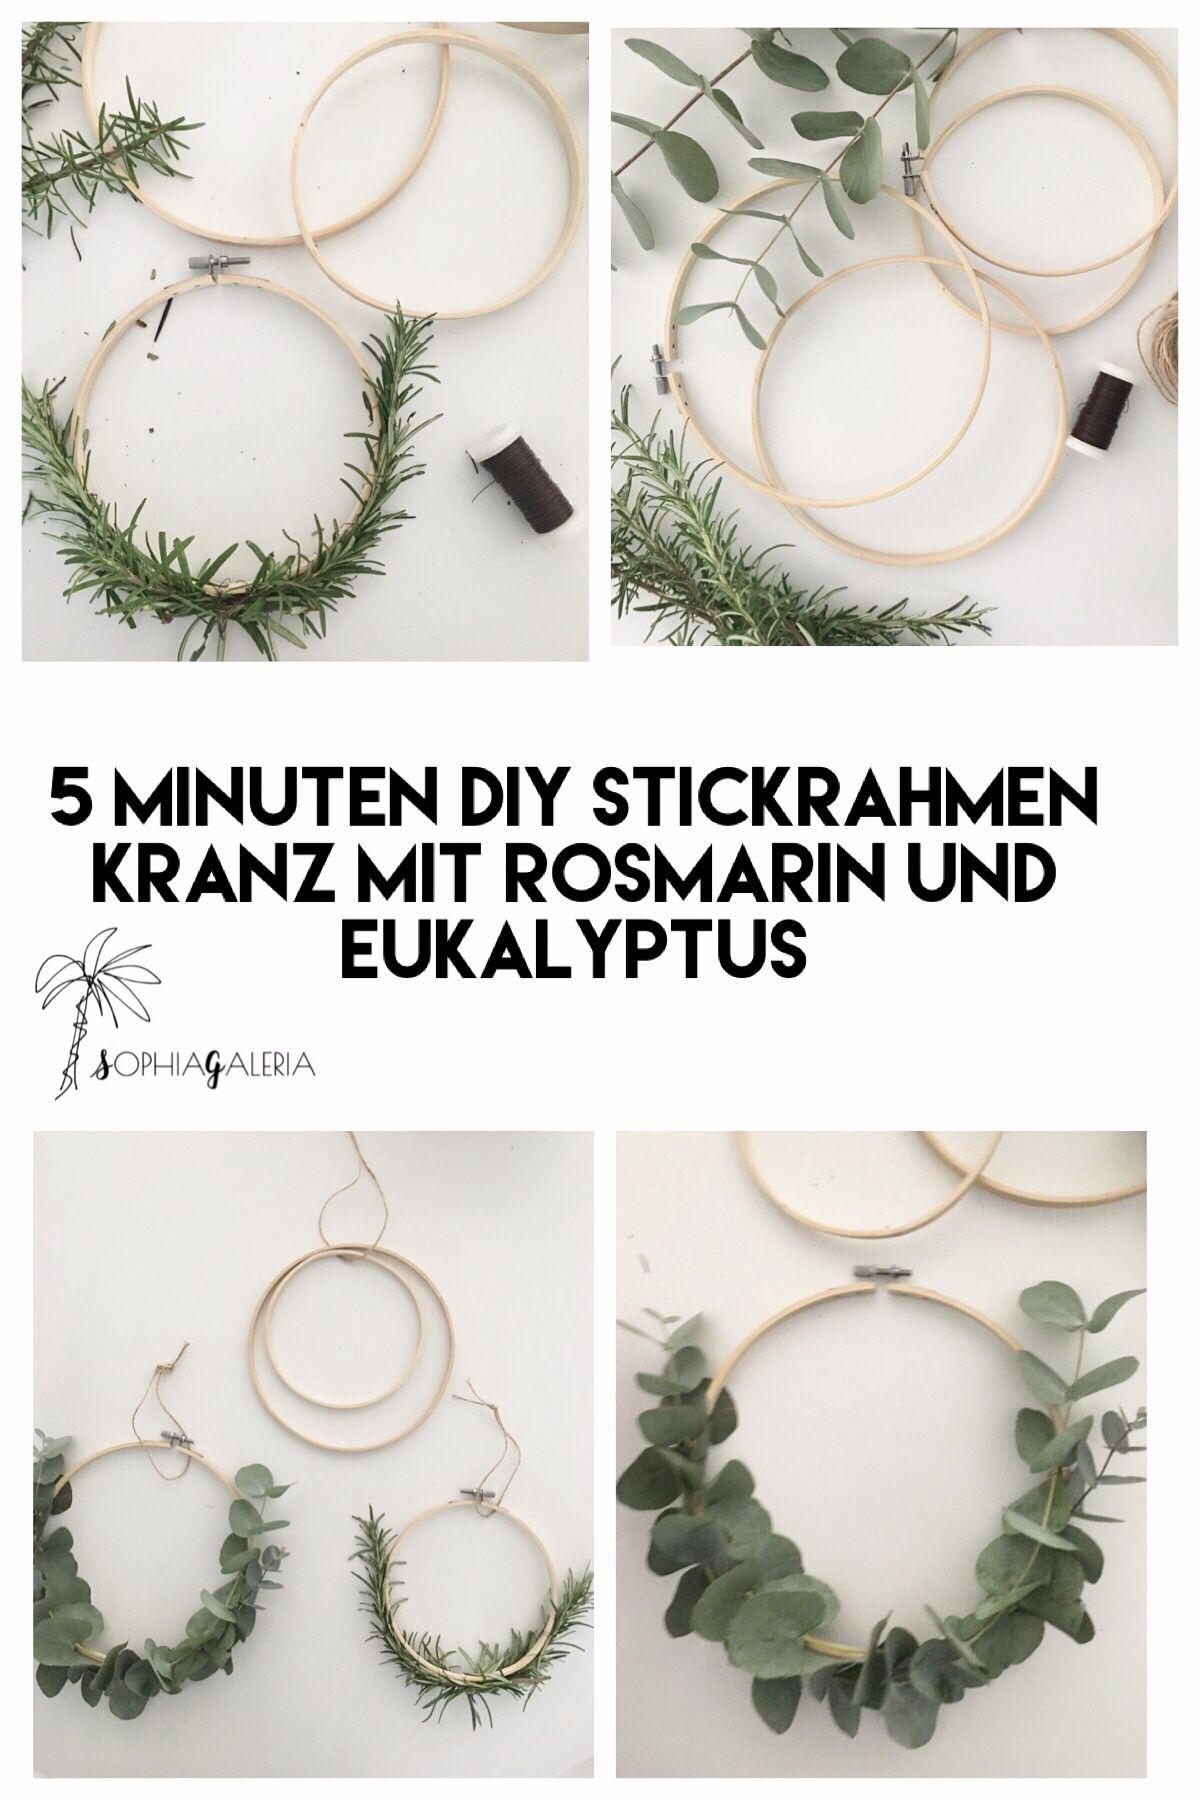 Photo of DIY embroidery hoop wreath with rosemary and eucalyptus #kranz #deko